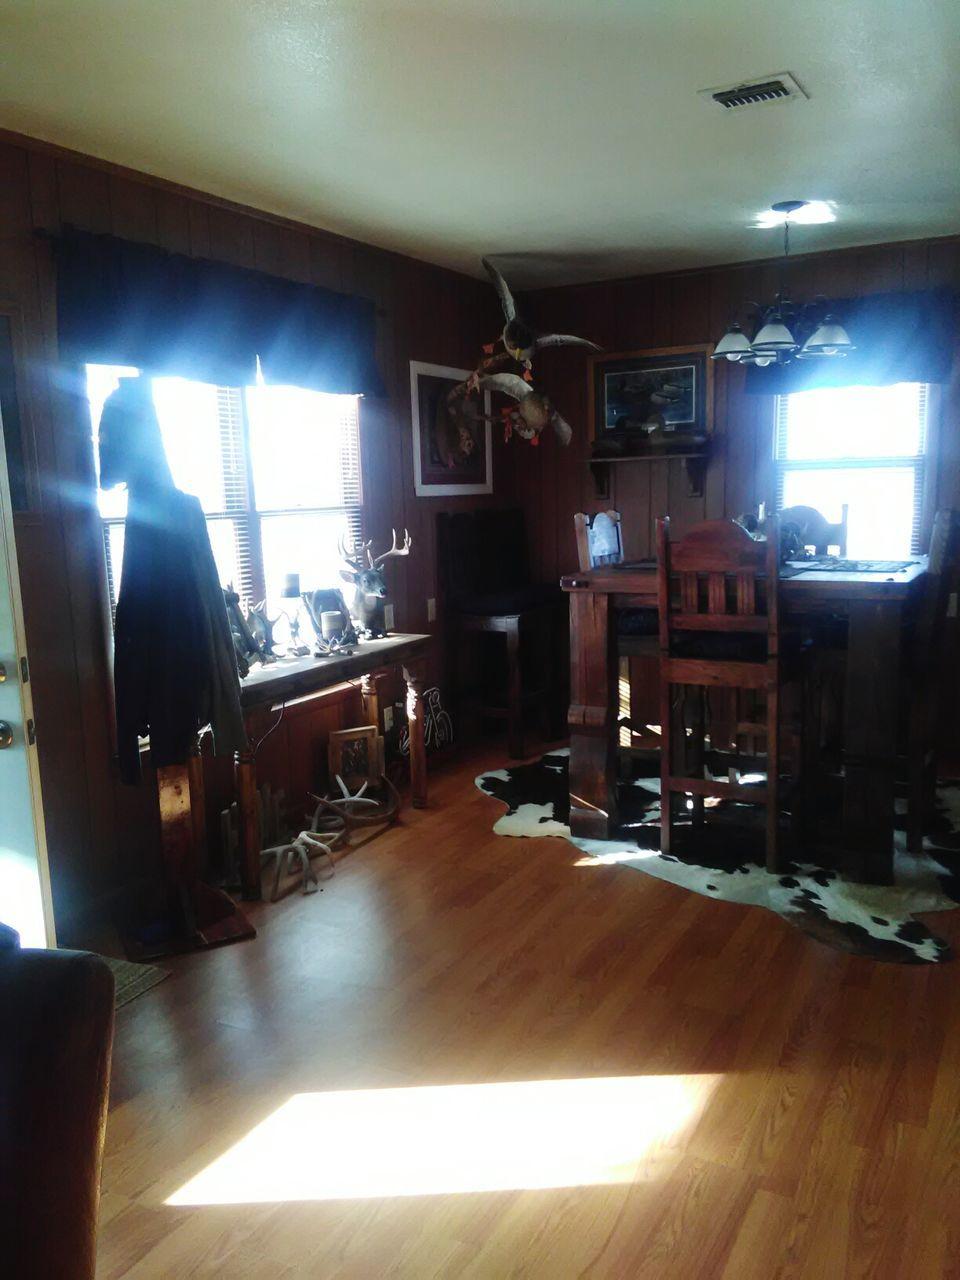 indoors, chair, hardwood floor, illuminated, home interior, no people, day, home showcase interior